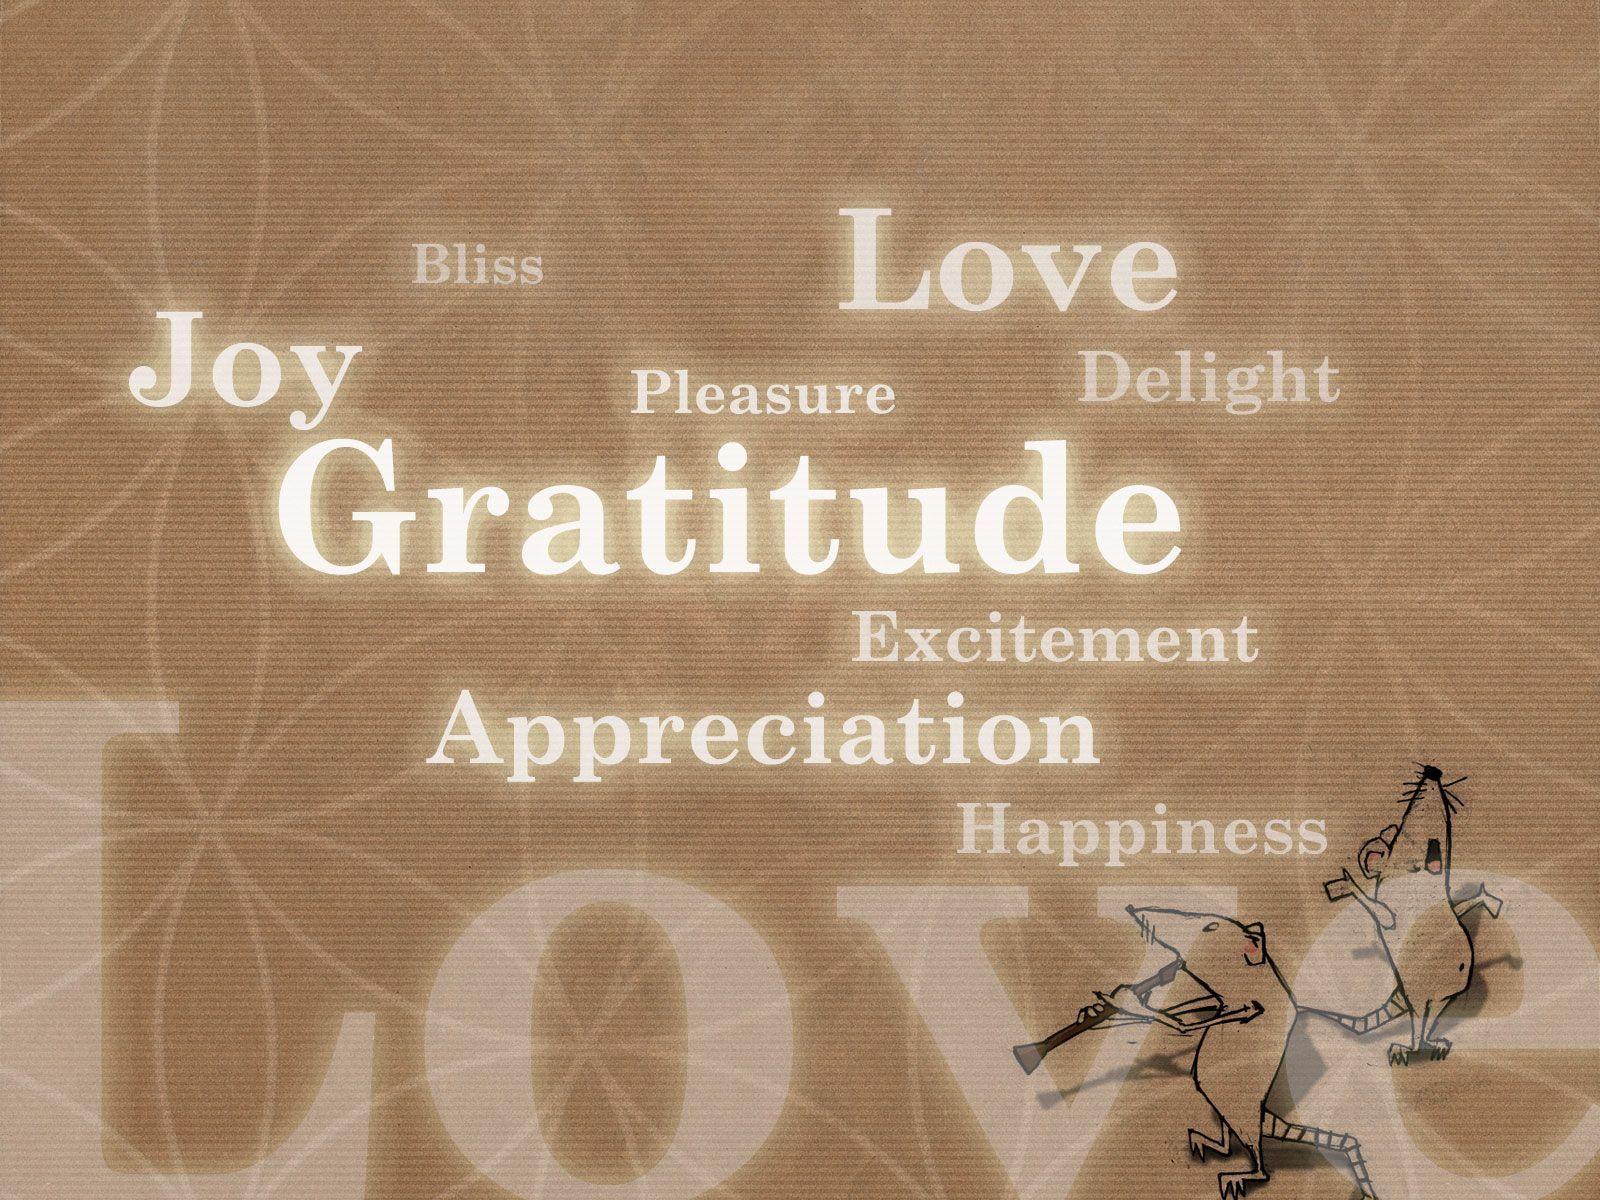 wednesday wallpaper gratitude brings - photo #26